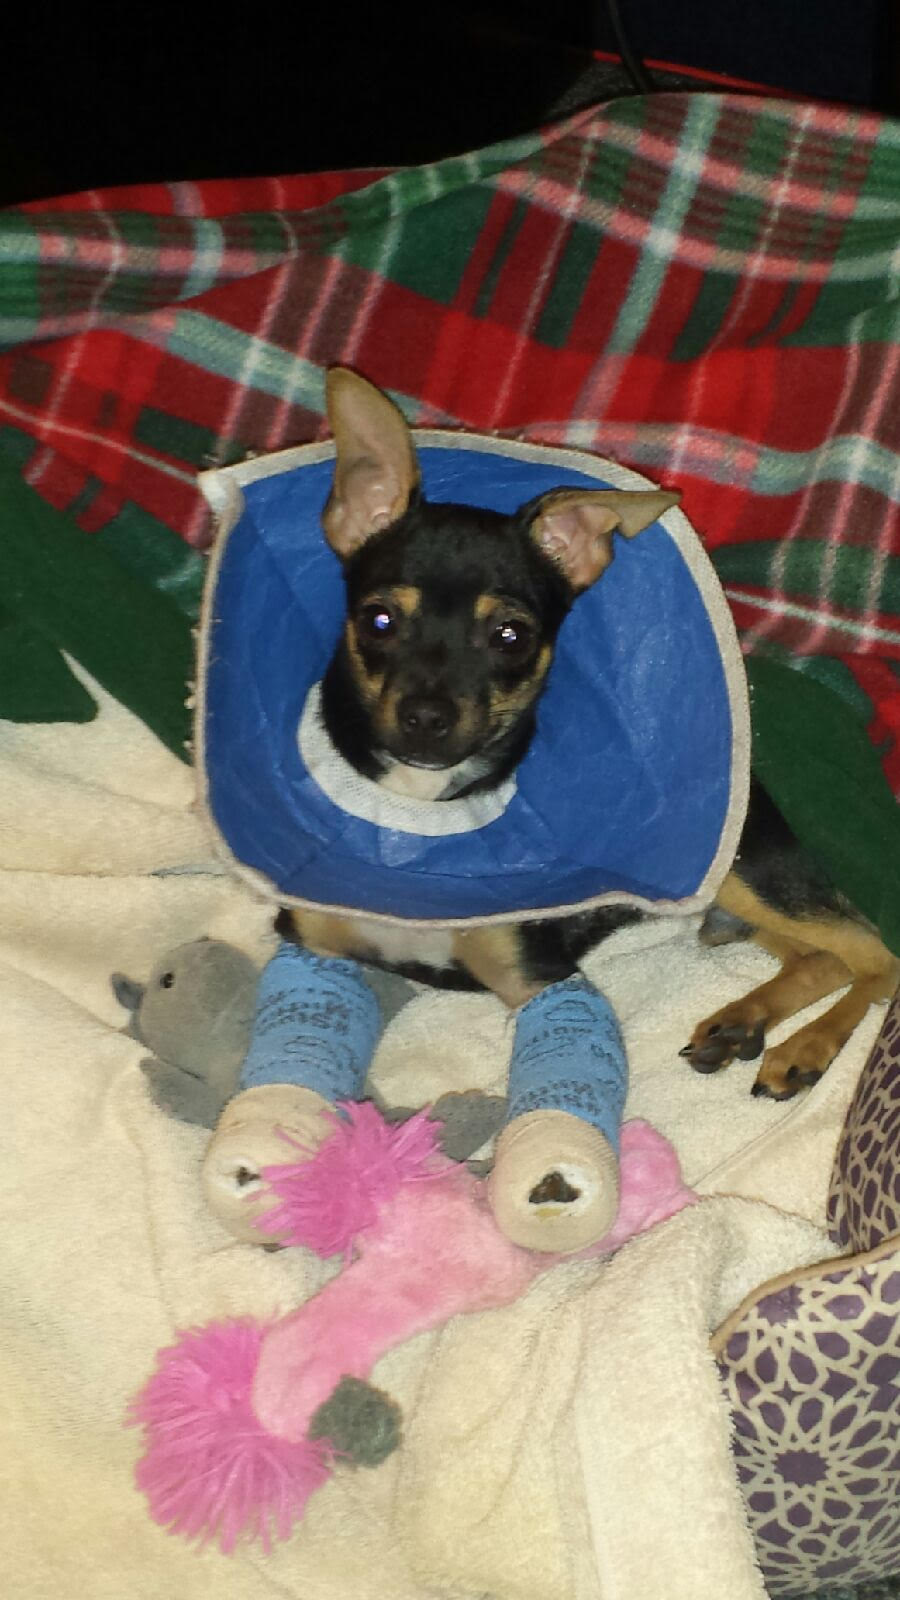 Little Bearito after his first splint change.